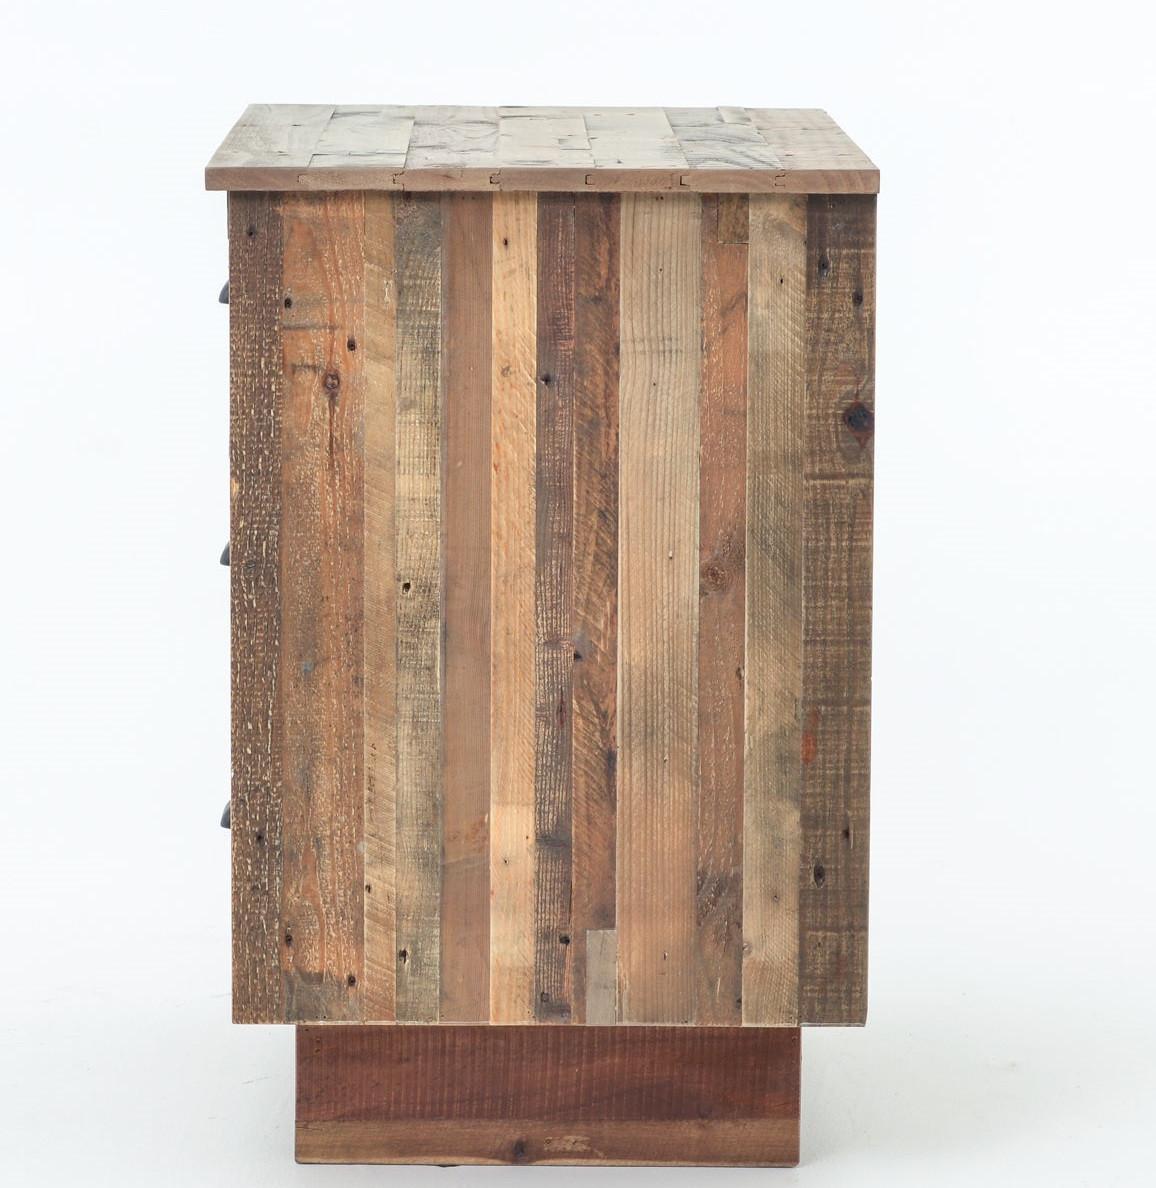 ... Angora Reclaimed Wood Small Sideboard sale - Angora Reclaimed Natural Wood Small Sideboard Chest Zin Home